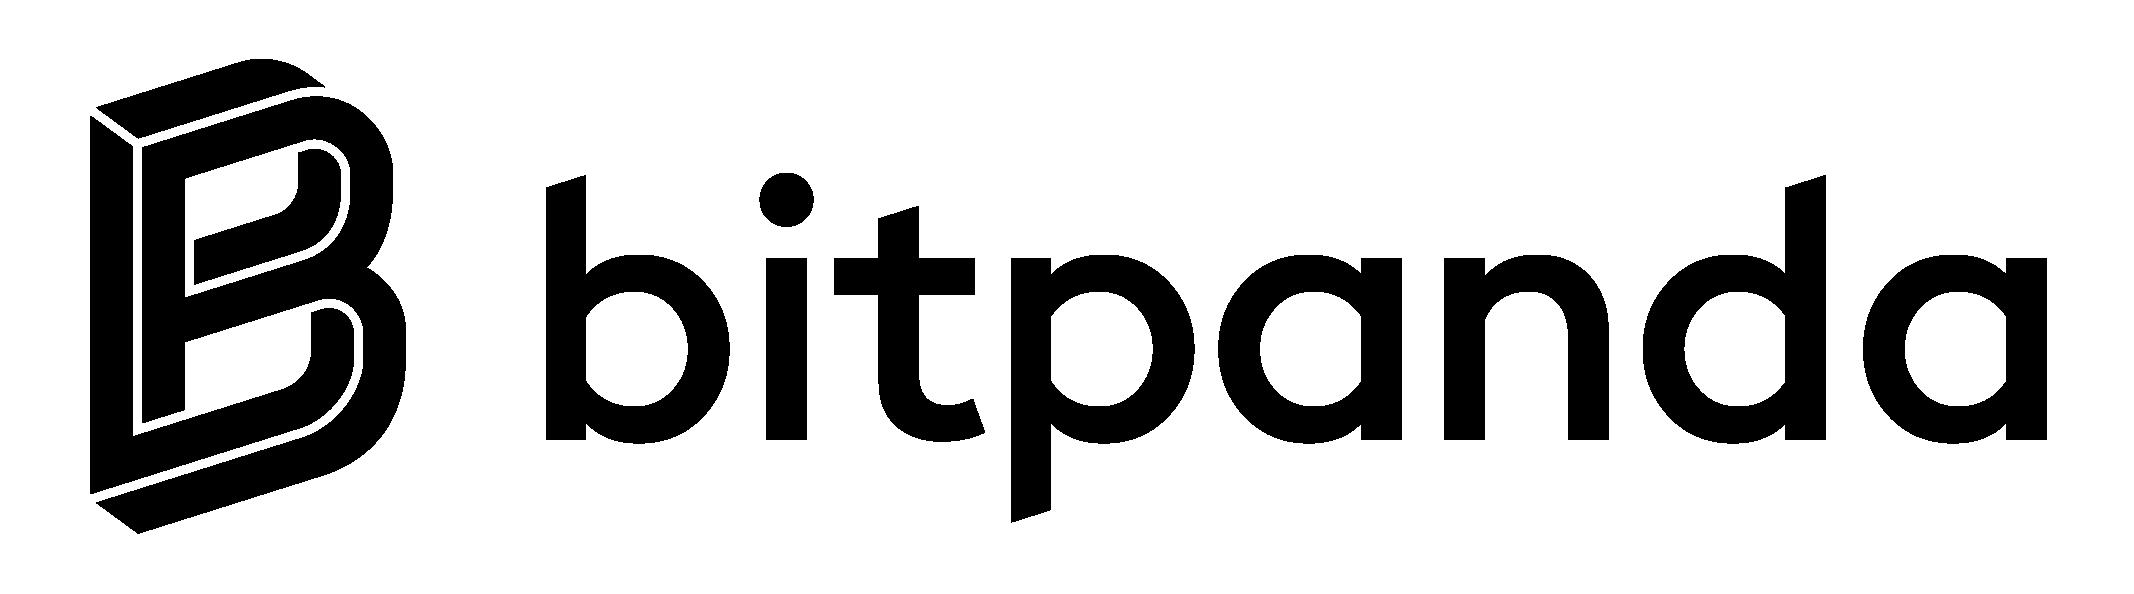 bitpanda_logo